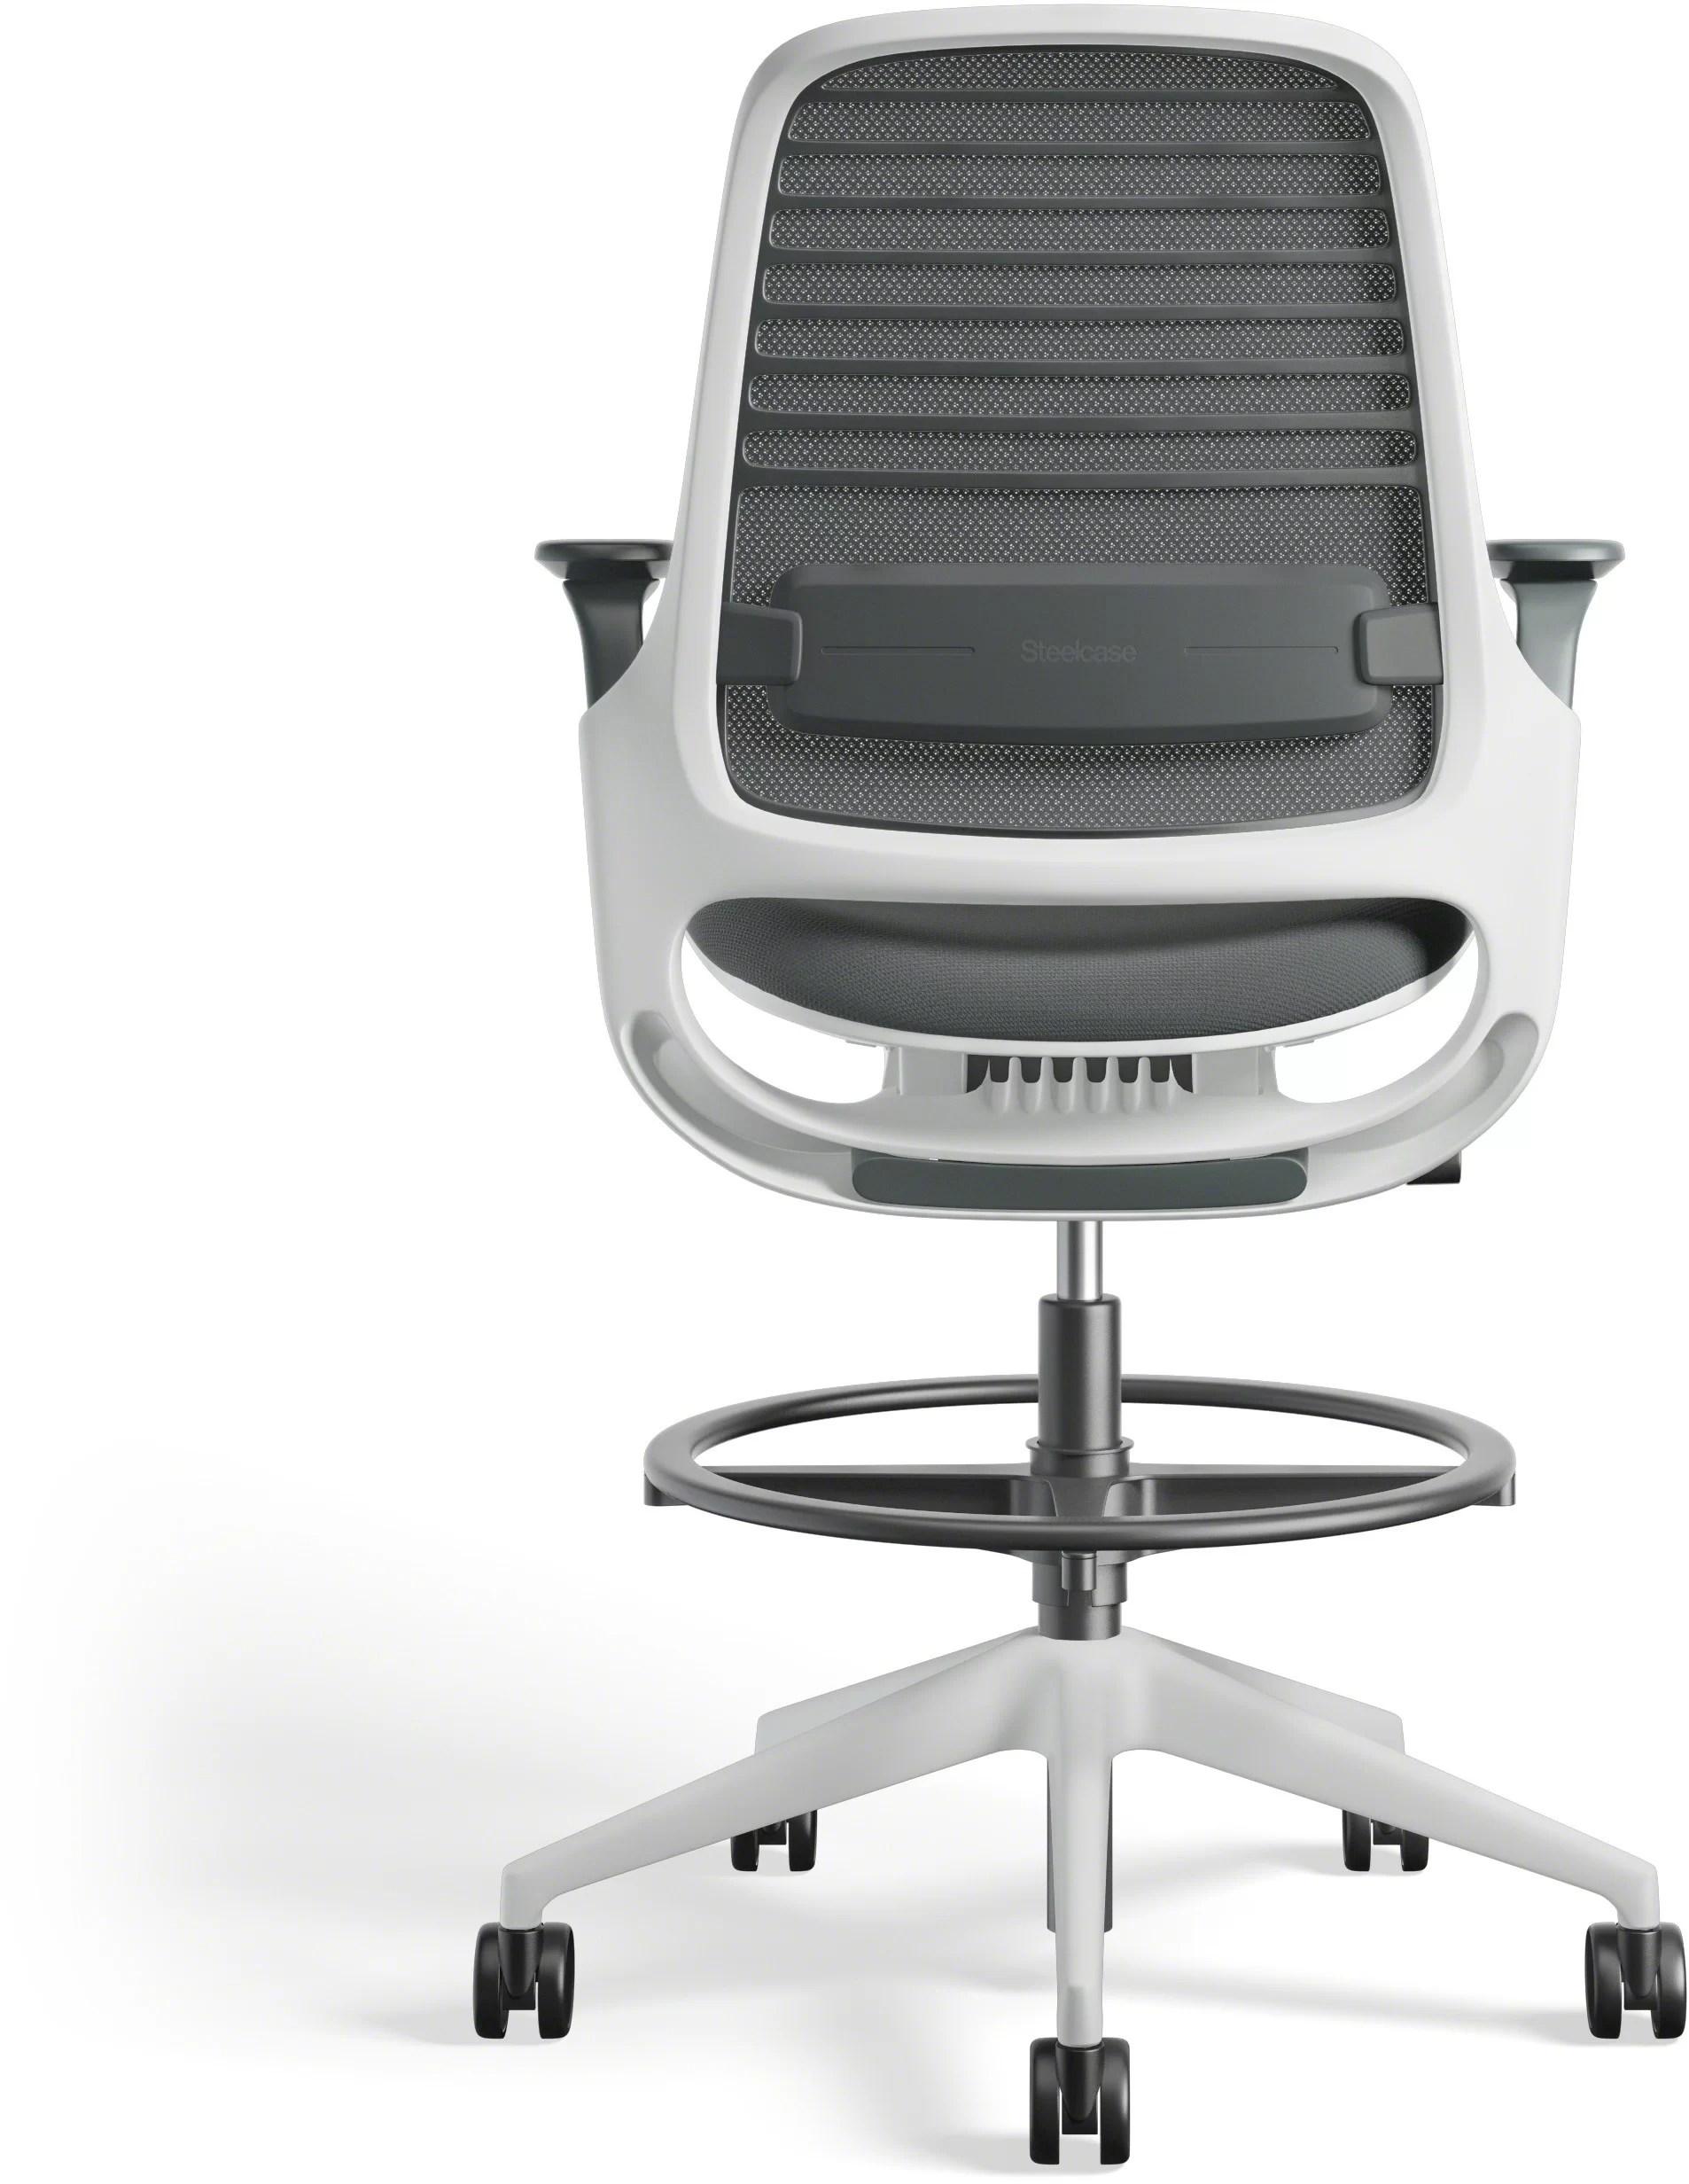 chair mesh stool turquoise adirondack chairs steelcase series 1 office wayfair